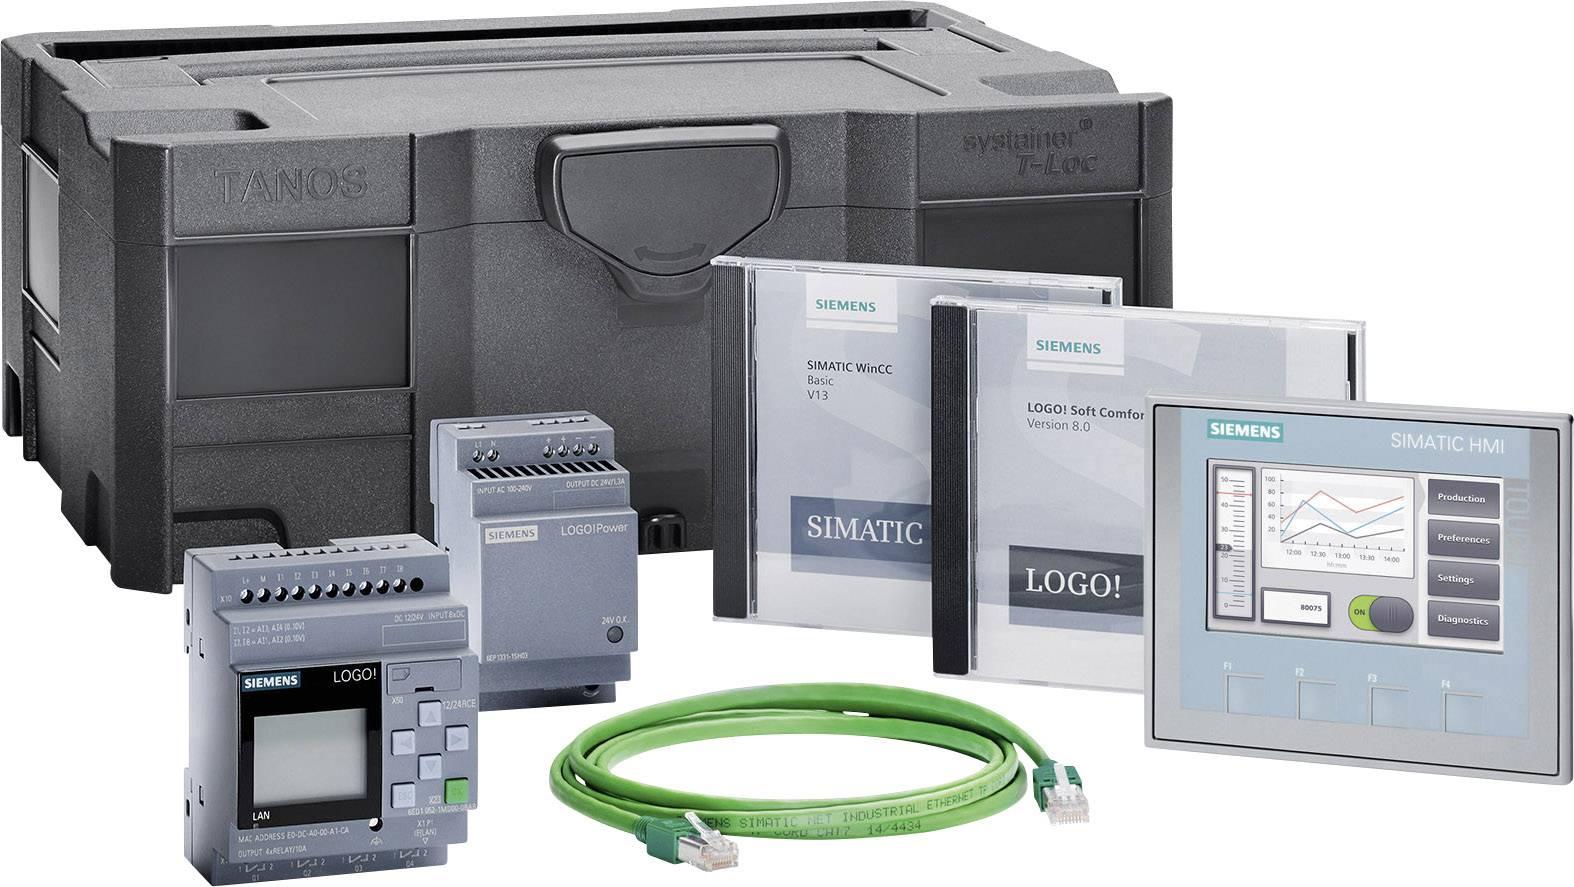 Štartovacia súprava Siemens LOGO! KTP400 BASIC STARTER LOGO! 12/24RCE 6AV2132-0KA00-0AA1